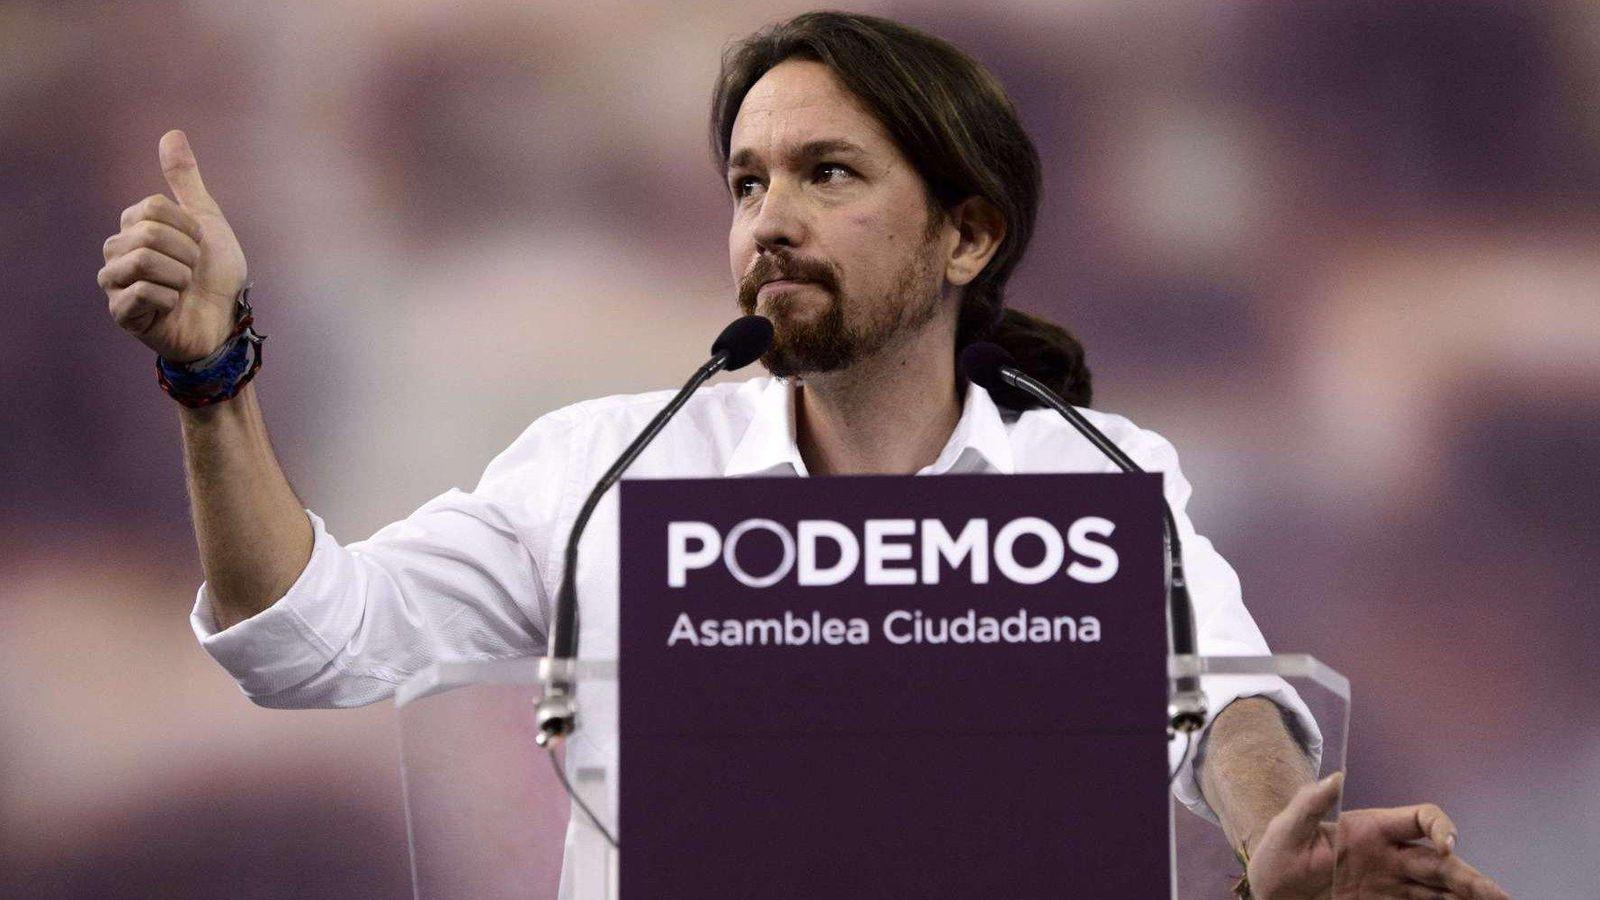 Foto: Pablo Iglesias en un mitin de Podemos (AFP)